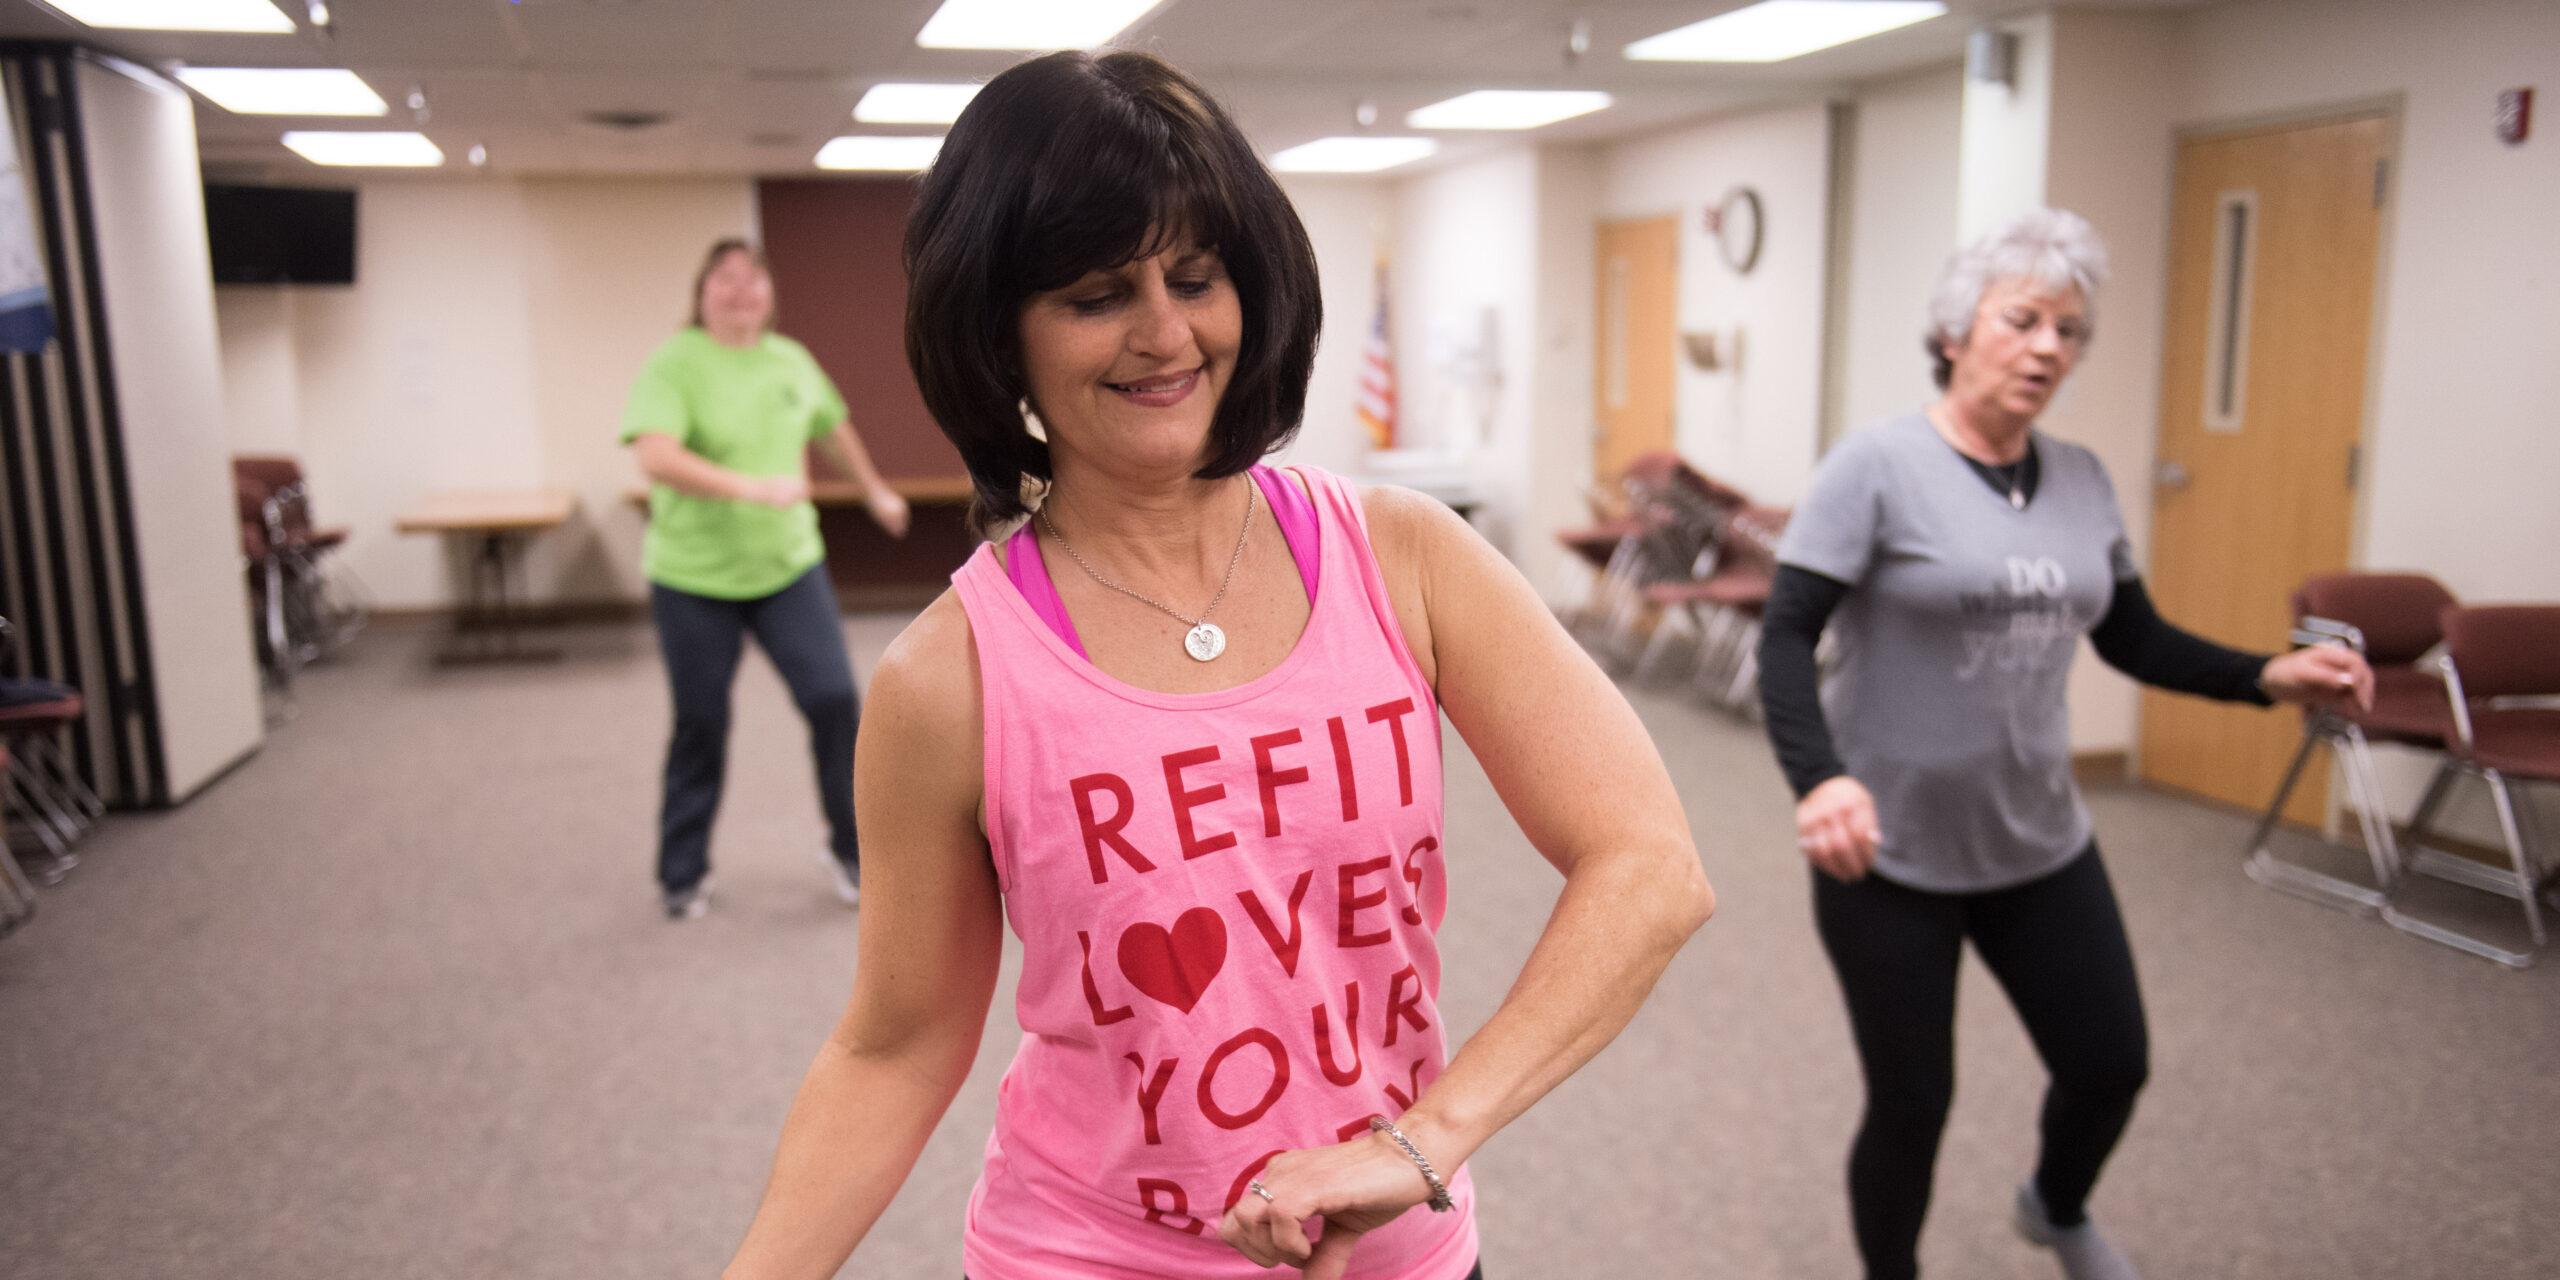 Instructor teaching a fitness class in Ottumwa, Iowa.